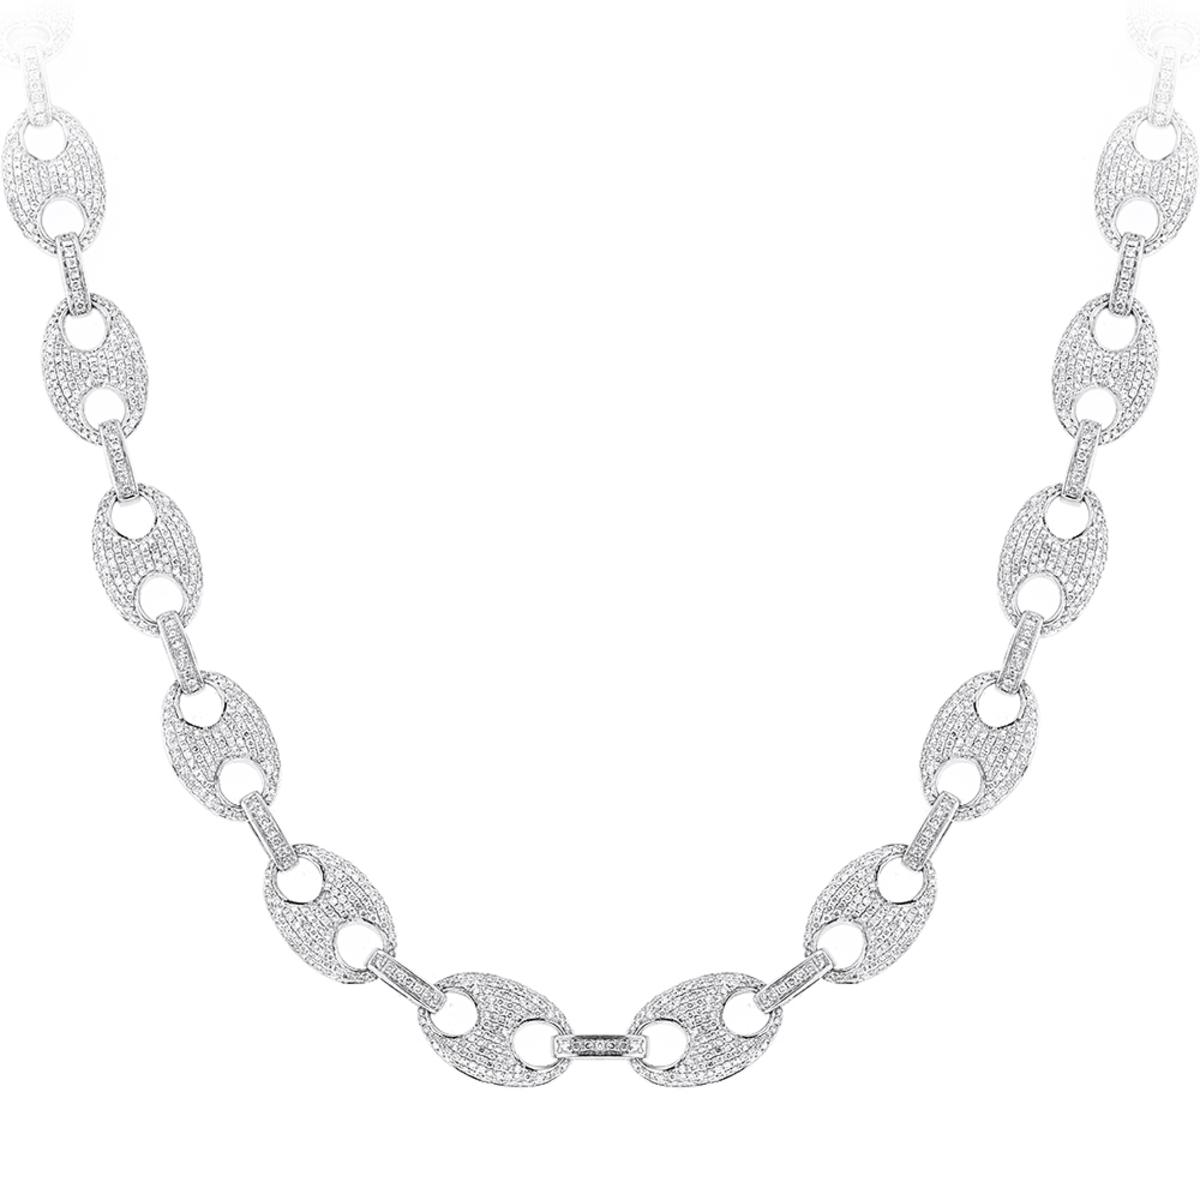 Diamond Chains 14K Gucci Link Diamond Necklace 24.52ct